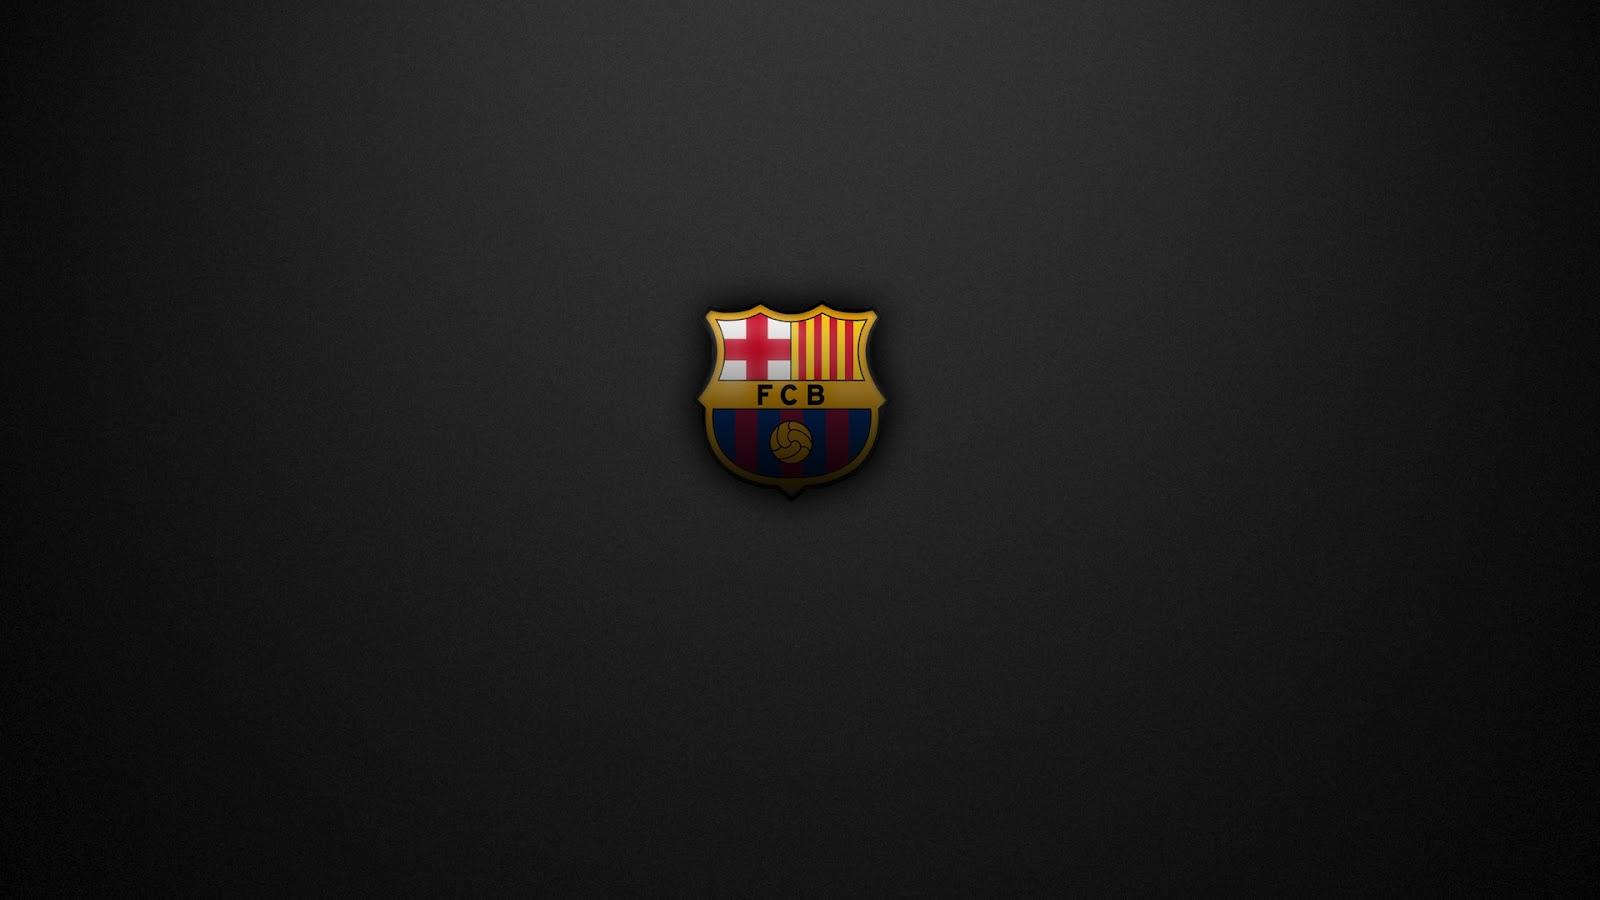 fc barcelona desktop wallpaper - photo #21